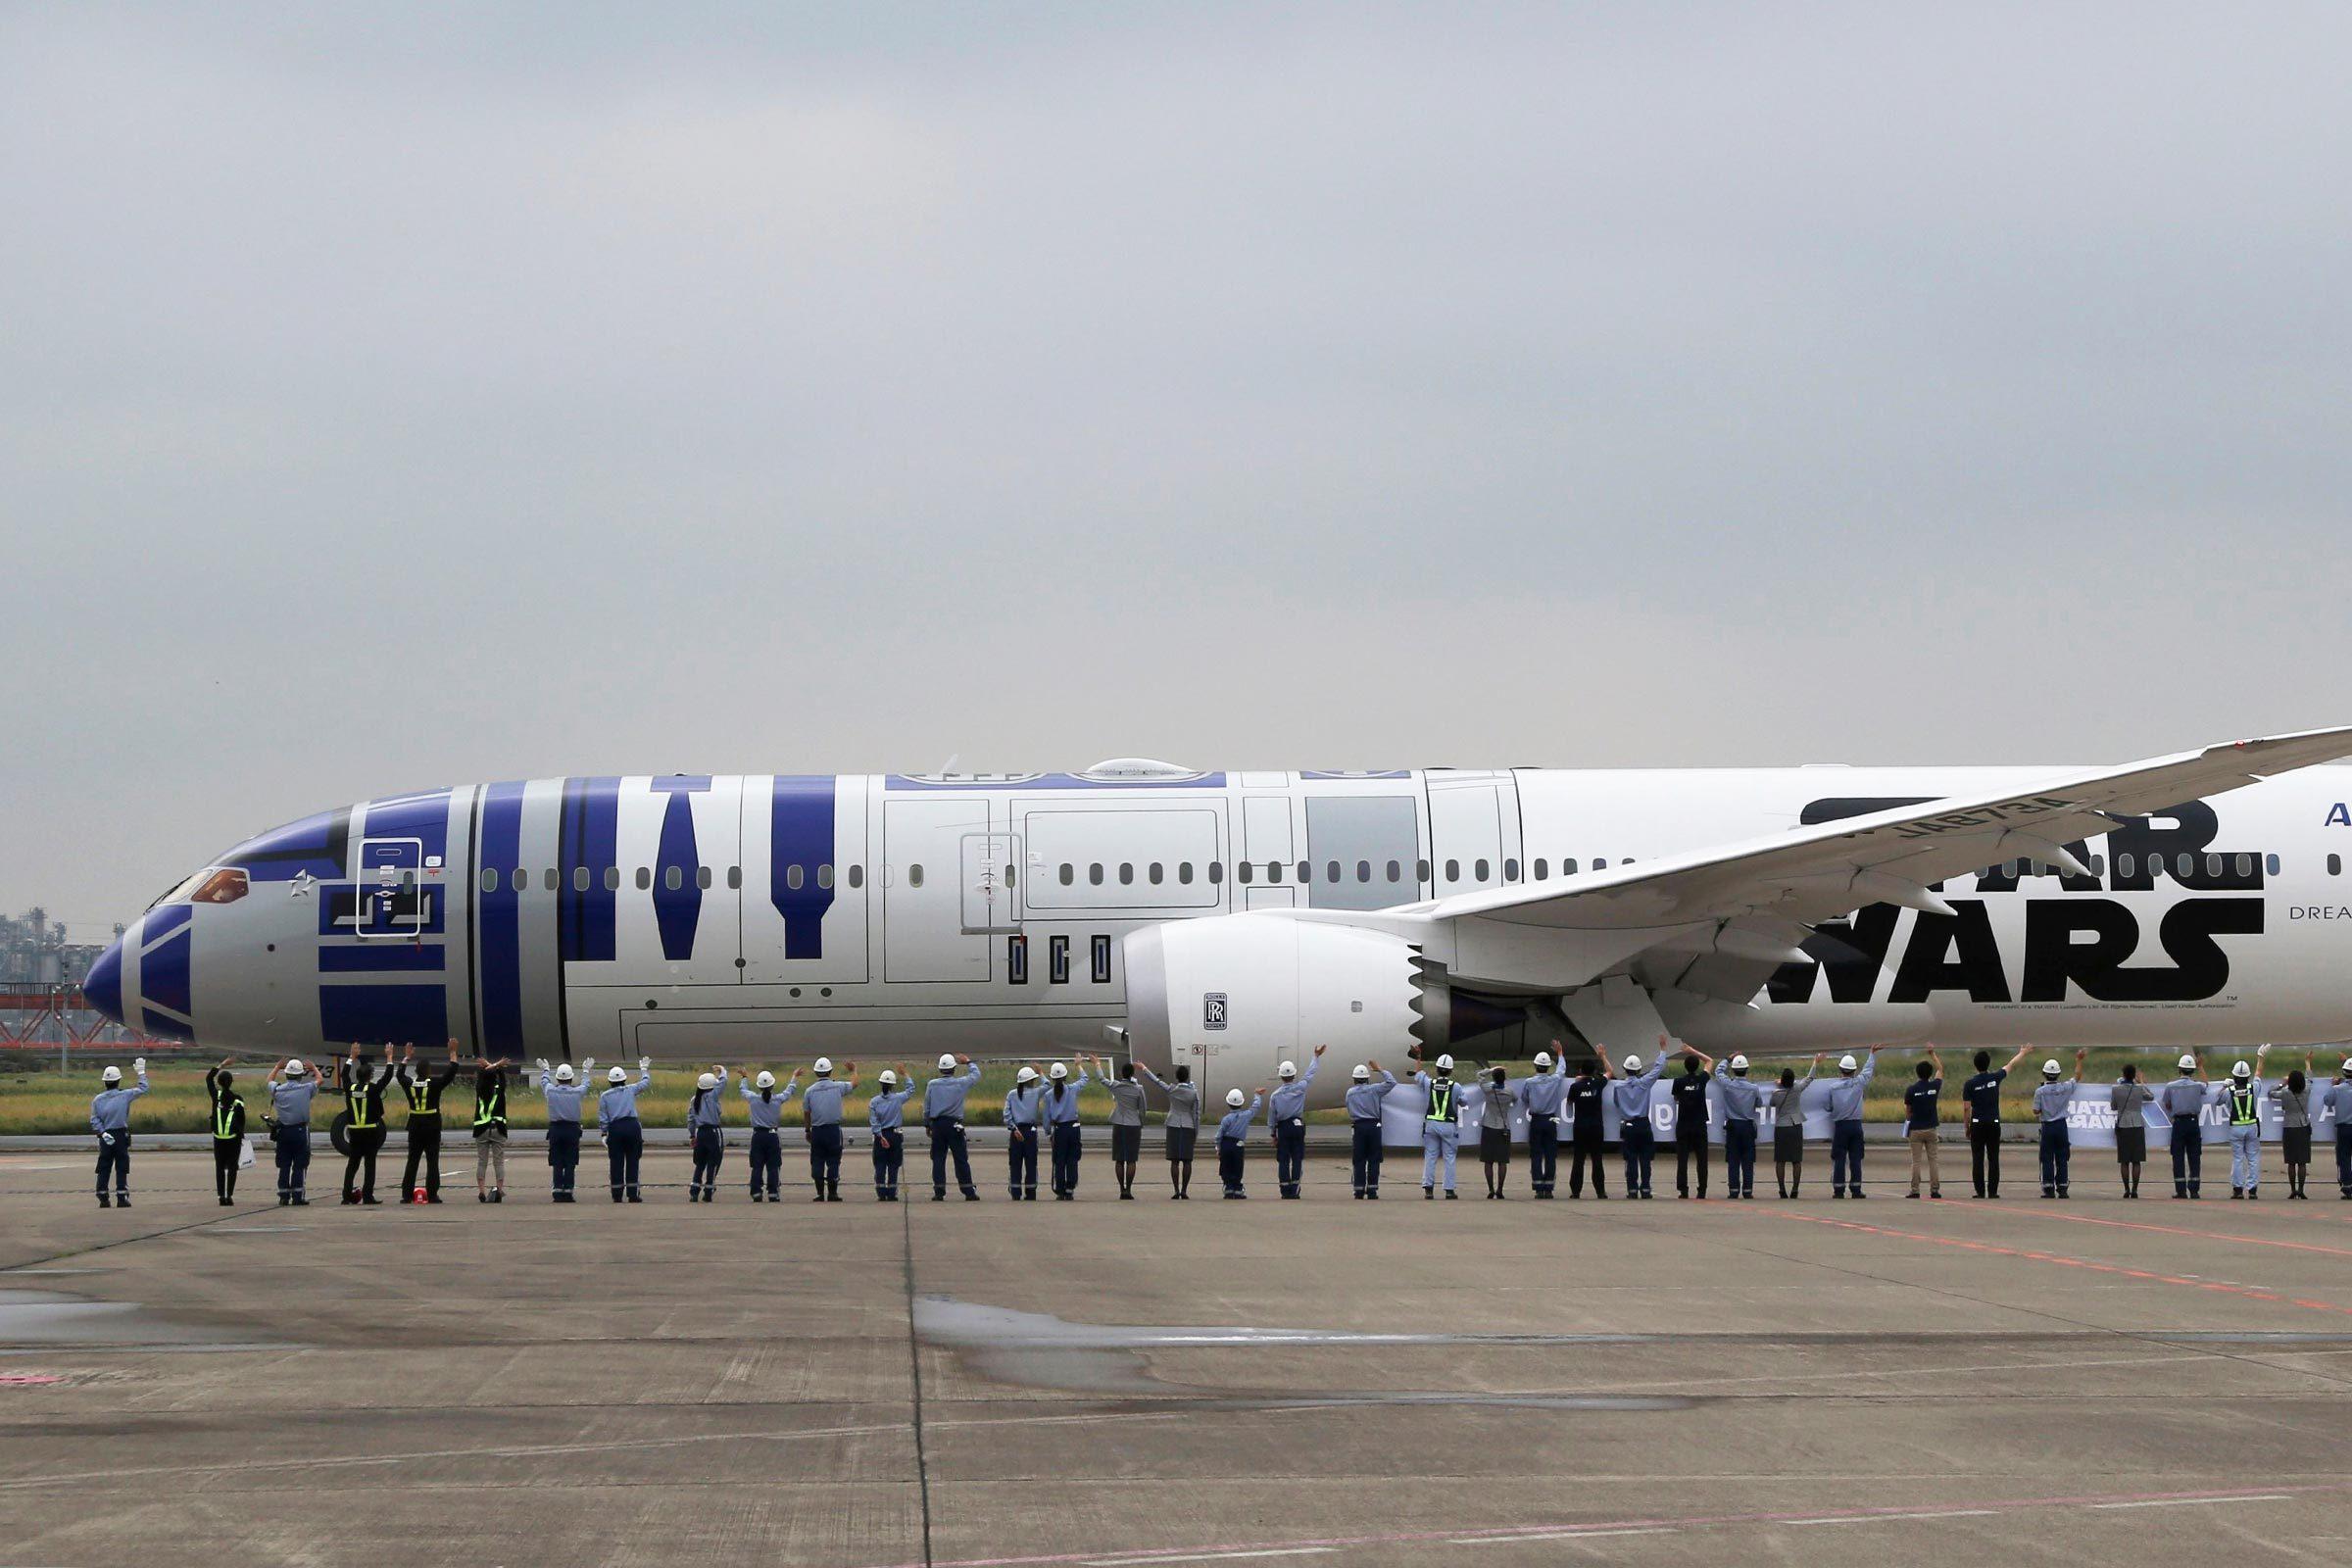 nippon airline star wars jet